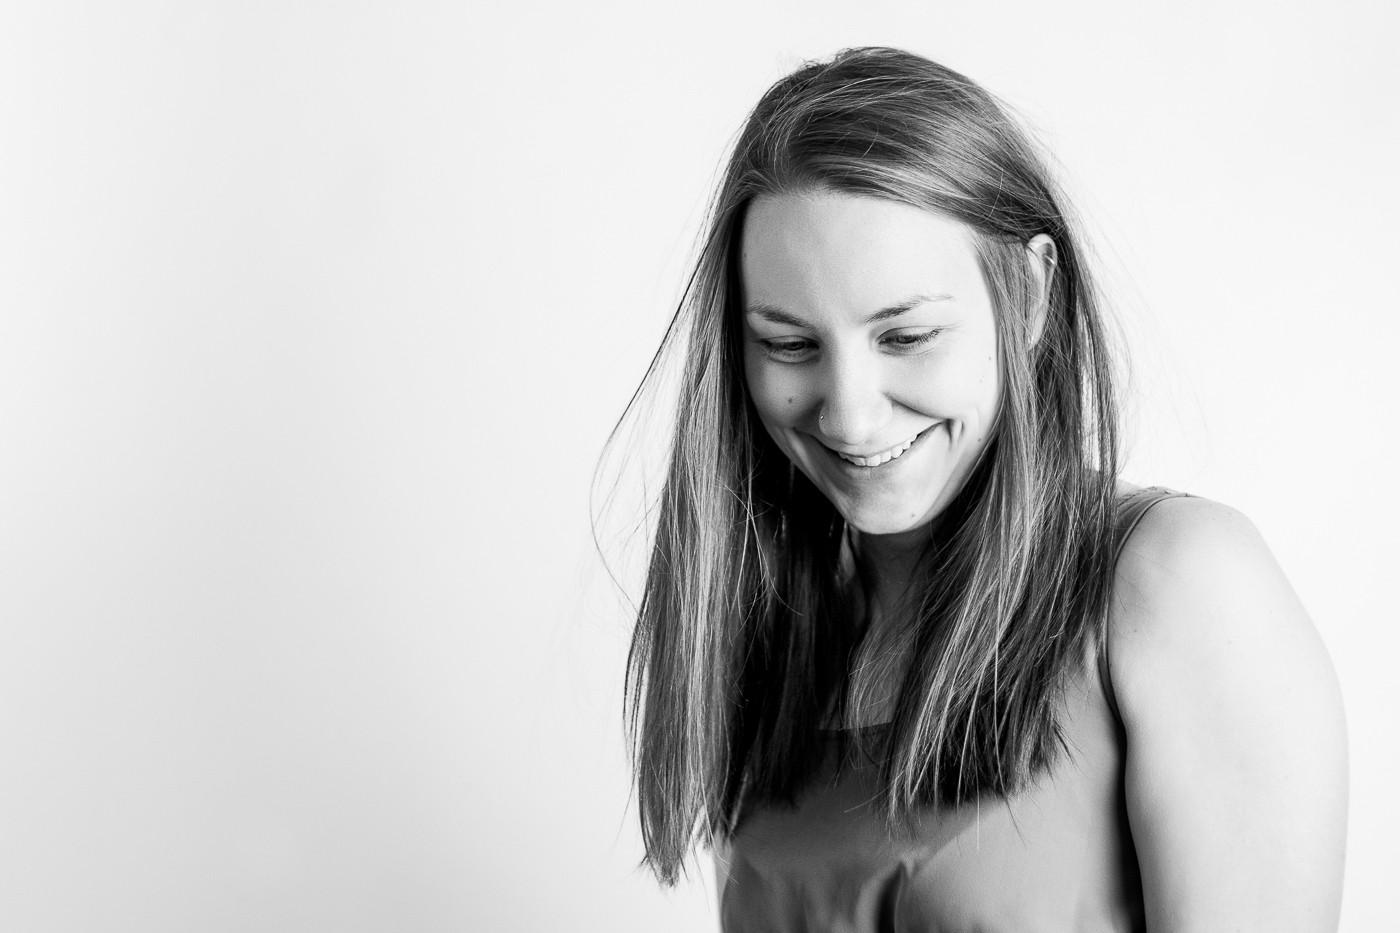 Portraits-67.jpg